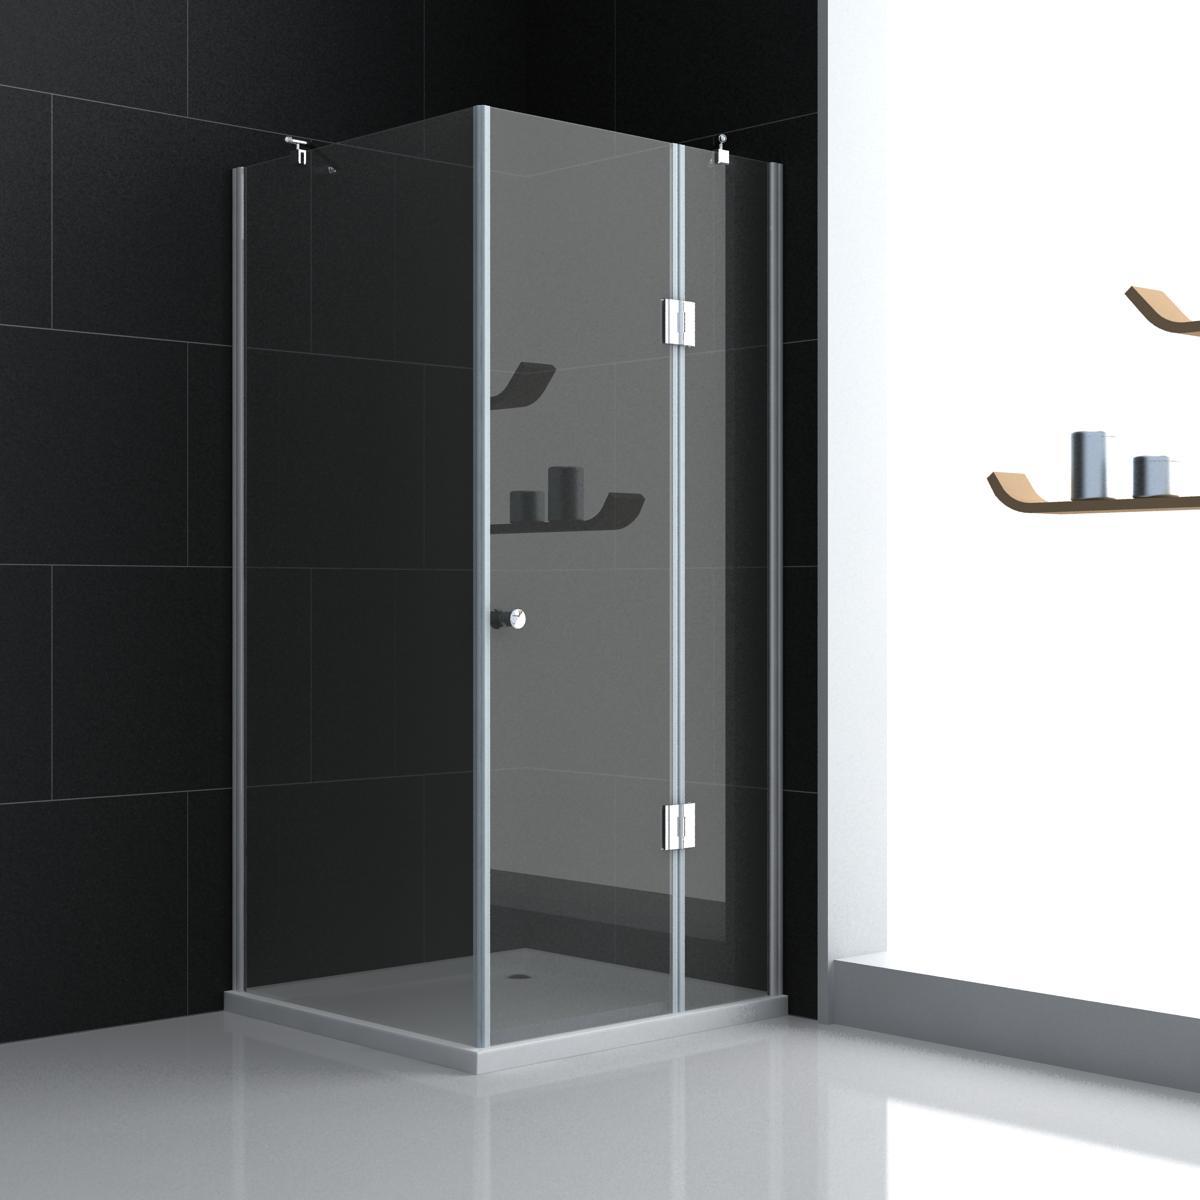 duschkabine dusche nano beschichtung duschtasse komplett 2 t ren halbkreis ebay. Black Bedroom Furniture Sets. Home Design Ideas